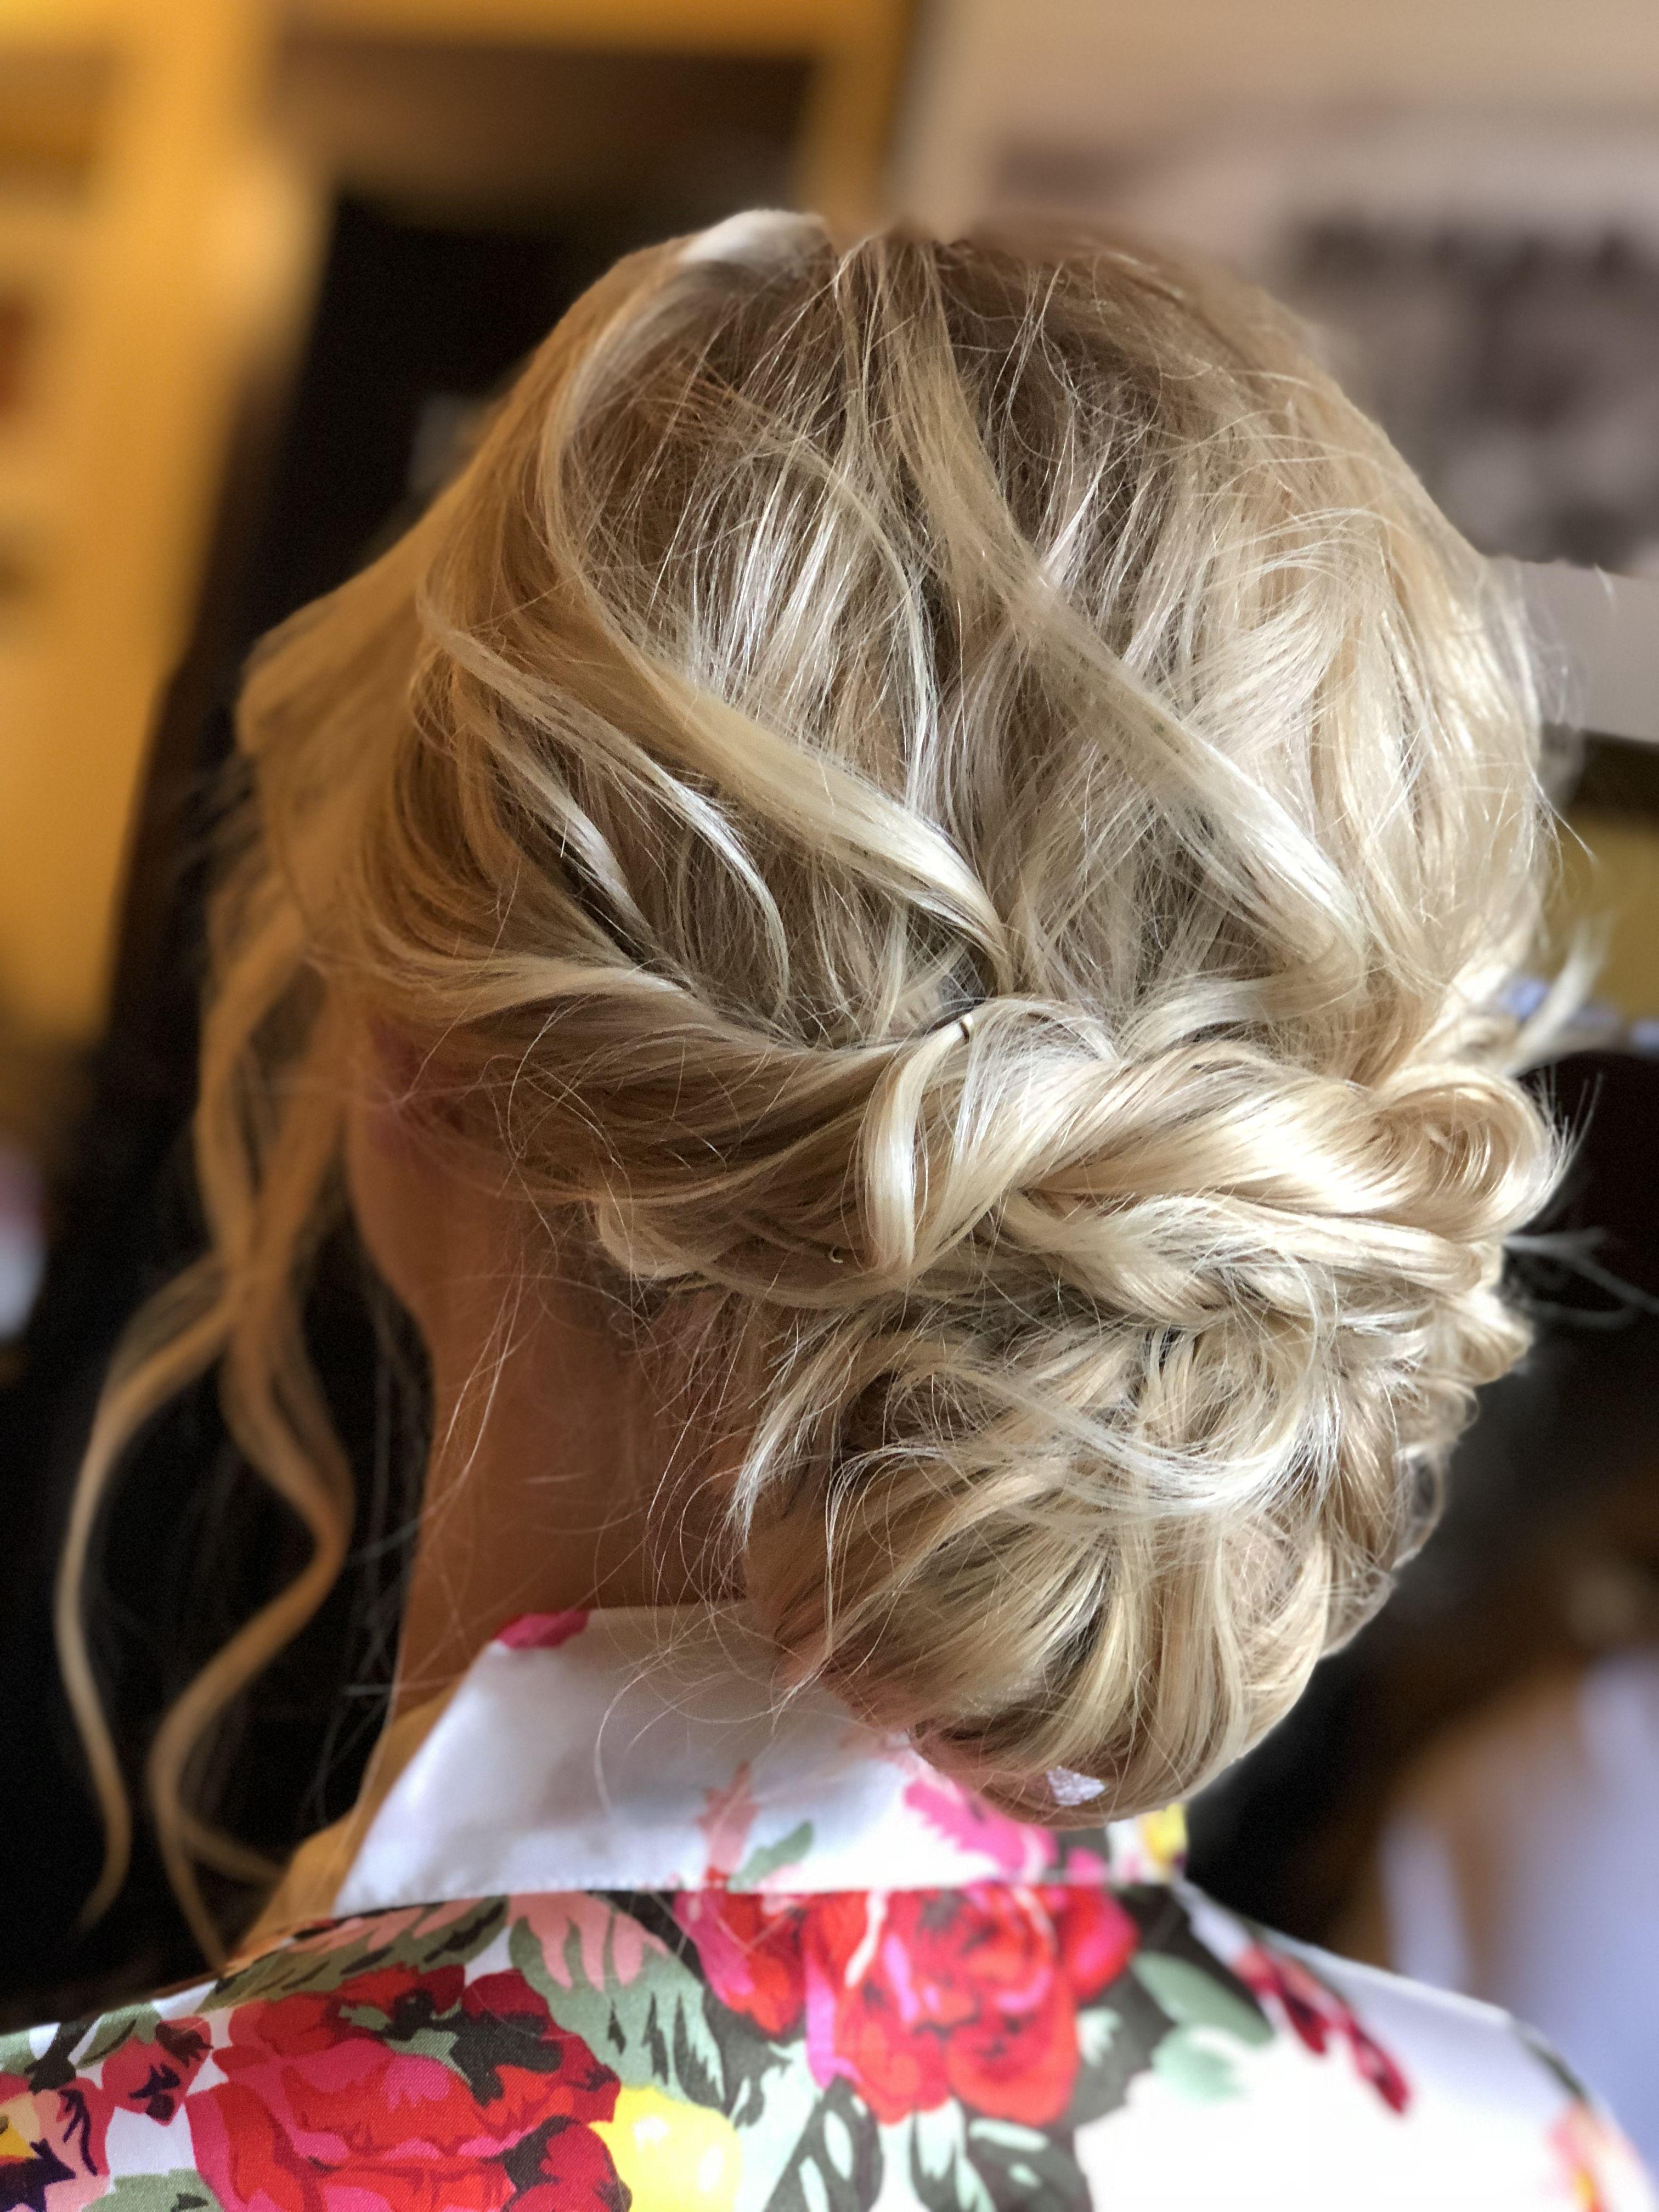 textured updo blonde updo fine hair updo chignon messy textured boho